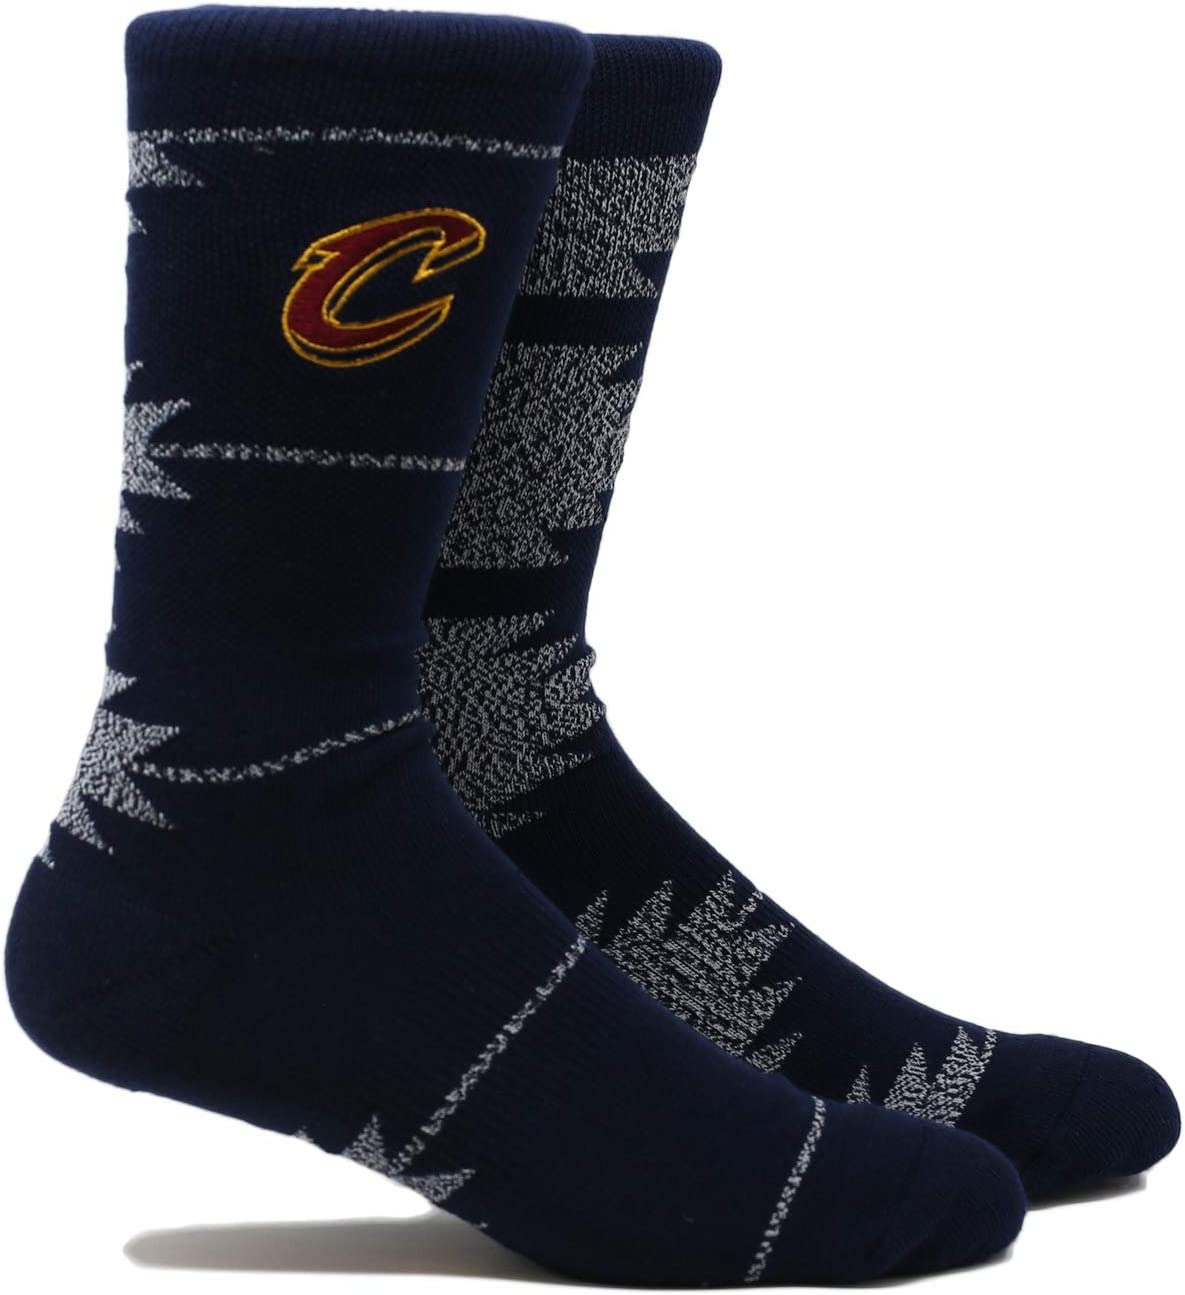 Pkwy NBA Cleveland Cavaliers Unisex Cavaliers Geo Crewcrew Socks